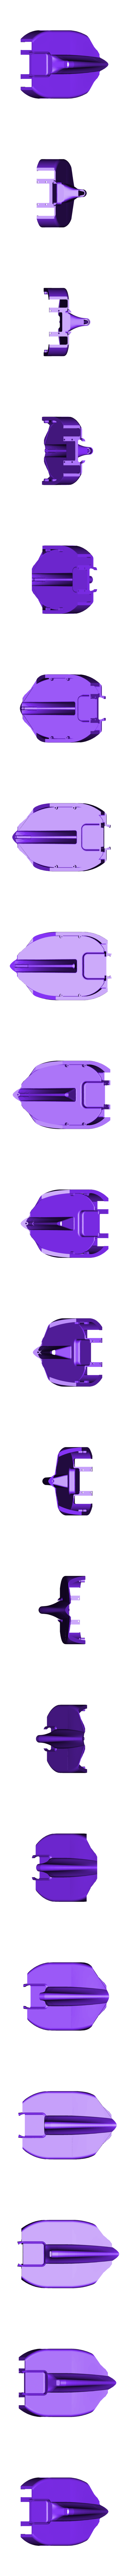 white center.stl Download free STL file Aryton Senna's Mclaren MP4/6 3d Printed RC F1 Car • 3D printing design, brett